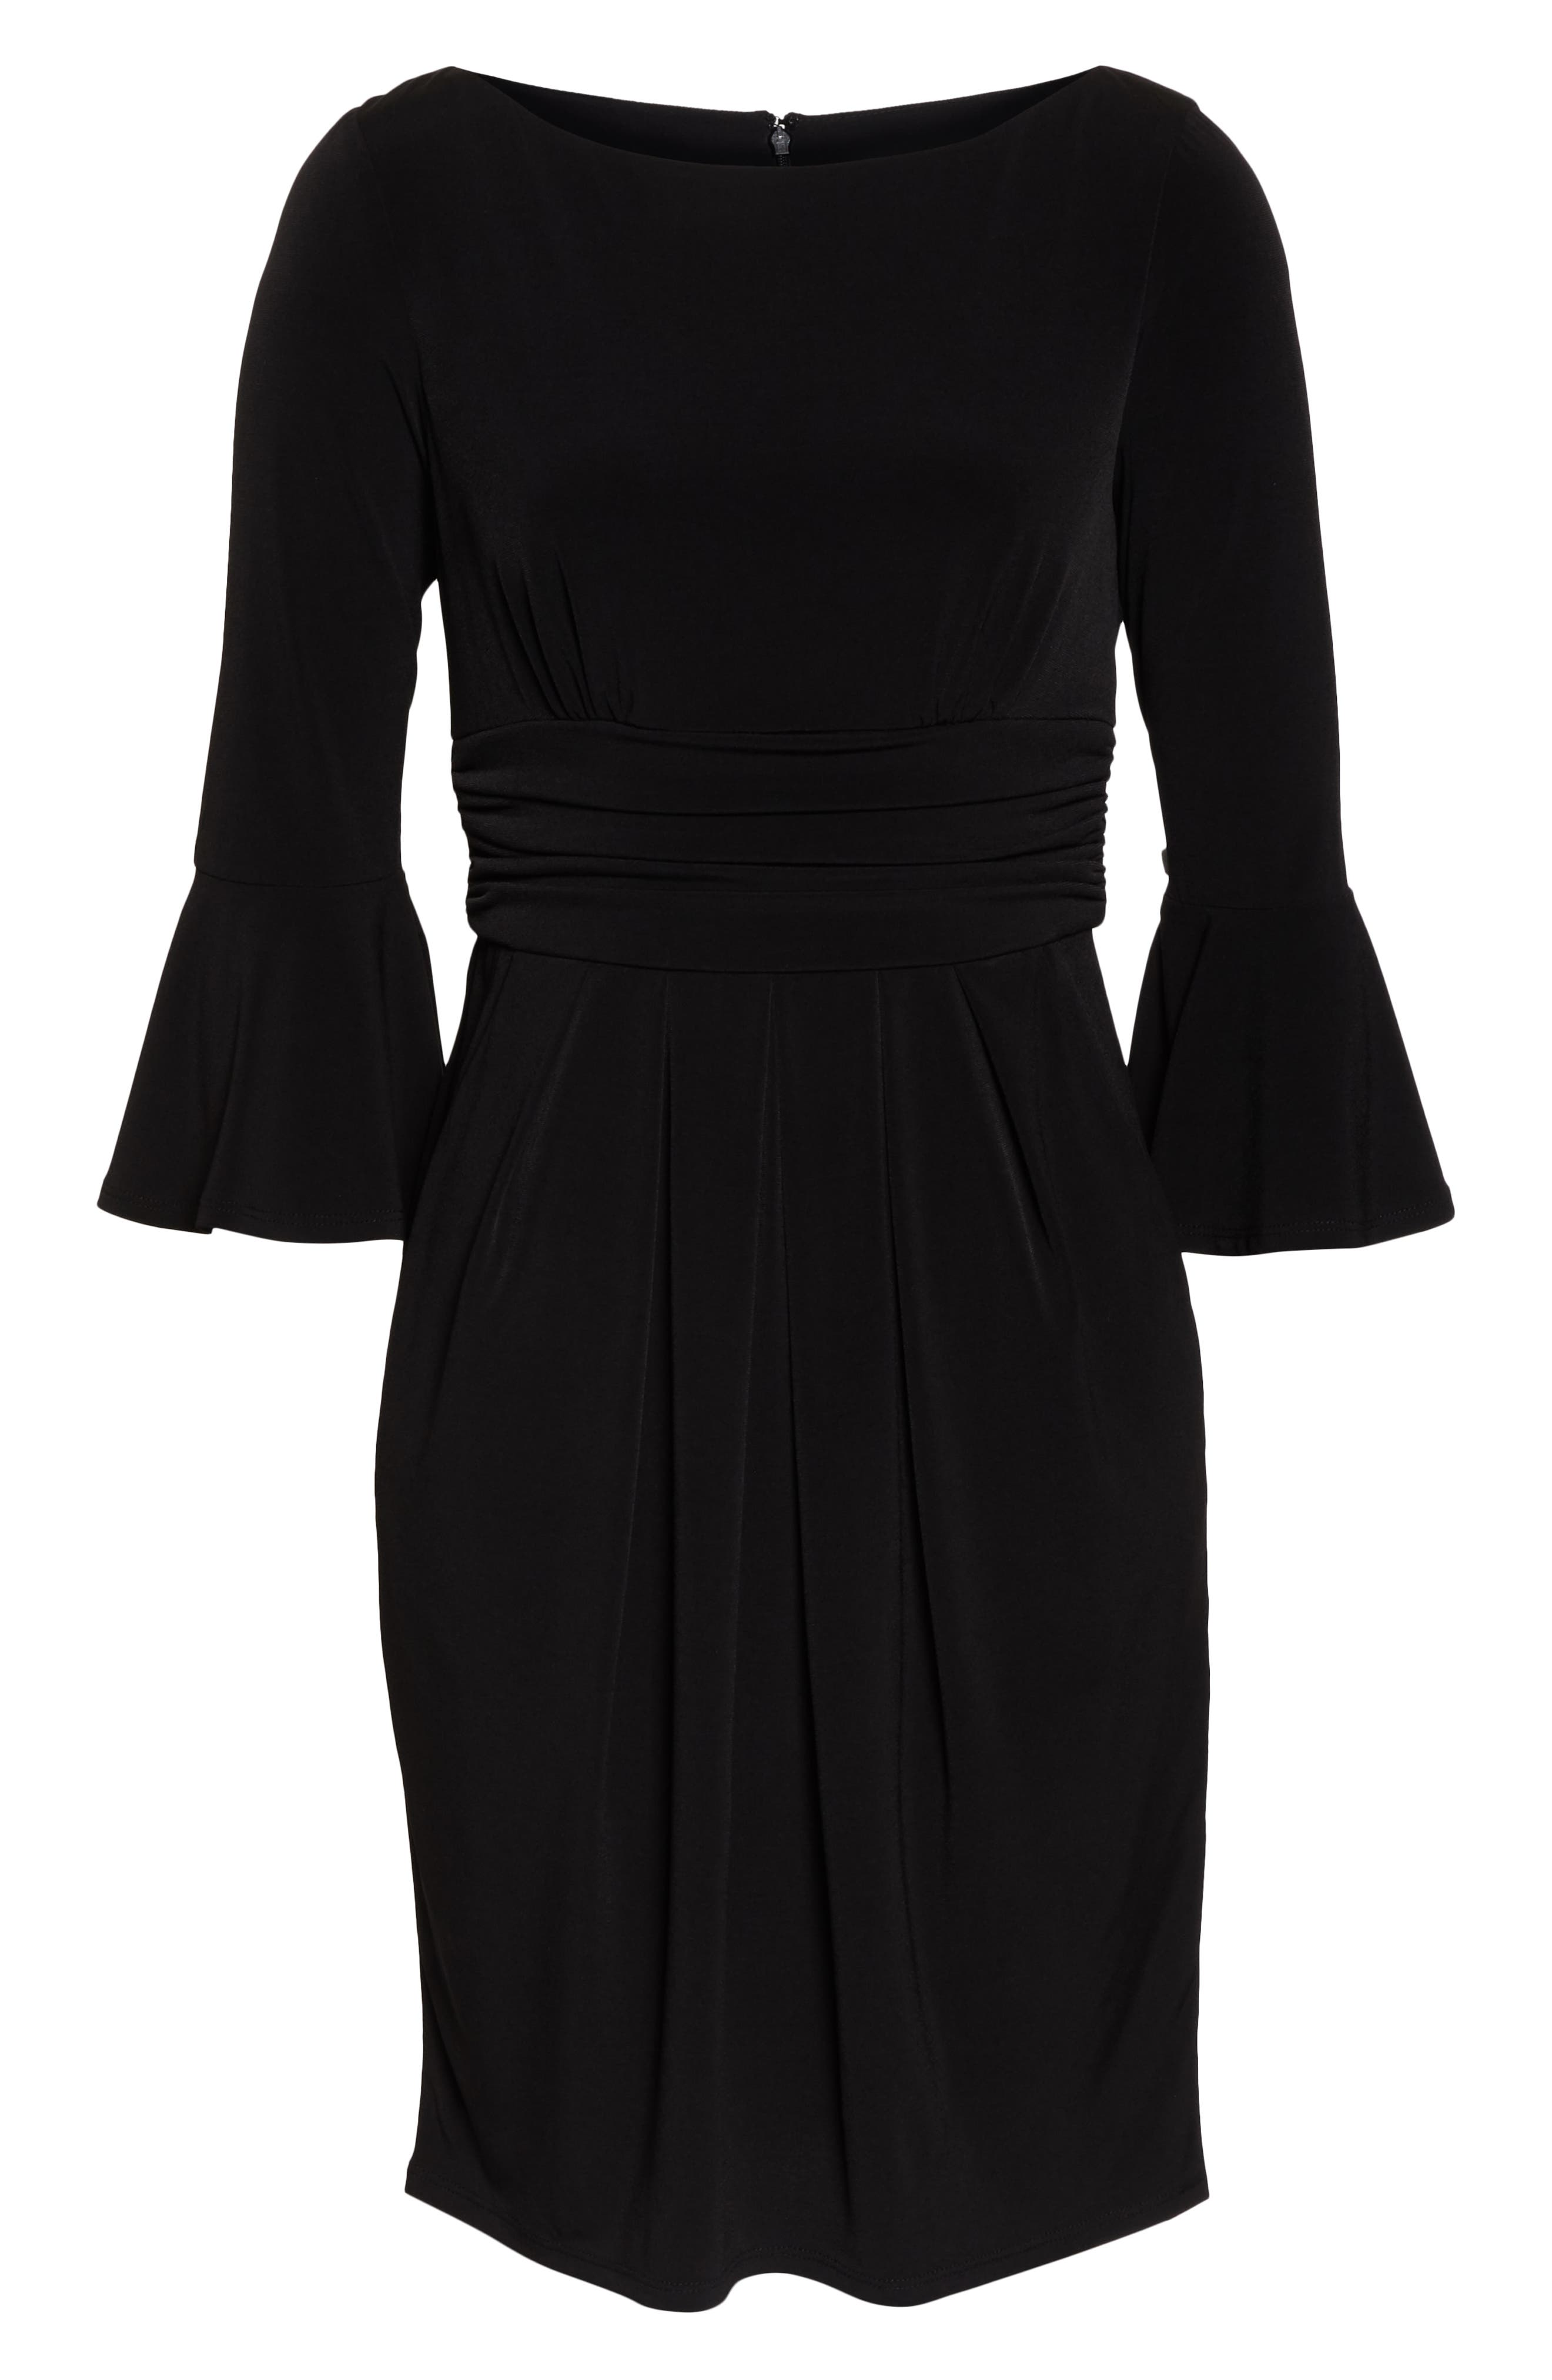 ELIZA J, Bell Sleeve Knit Sheath Dress, Alternate thumbnail 7, color, BLACK